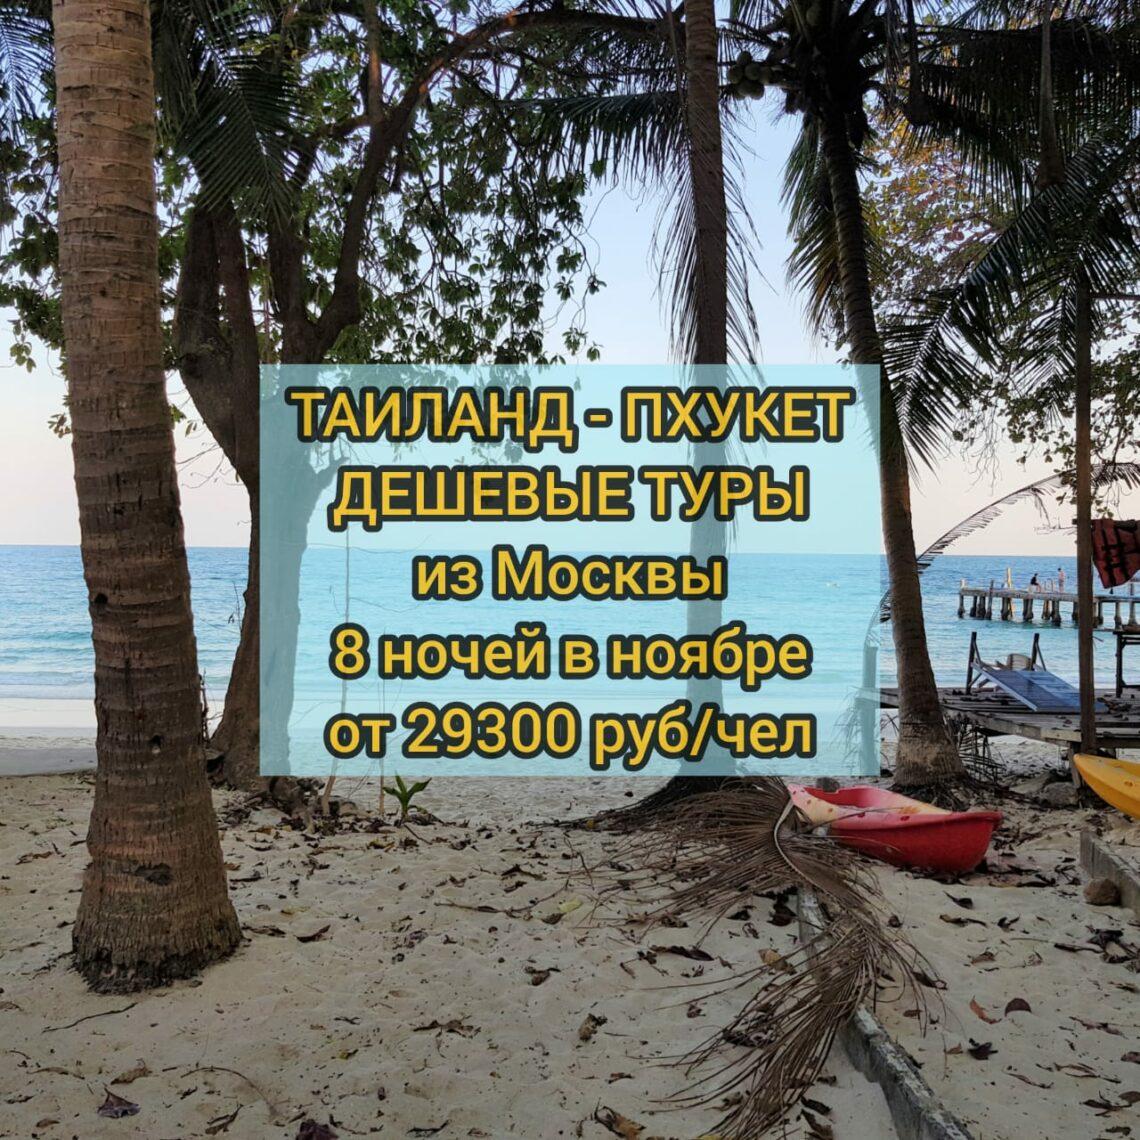 tur v tailand o phuket 17 153 rub chel - Тур в Таиланд о. Пхукет 17 153 руб. чел.